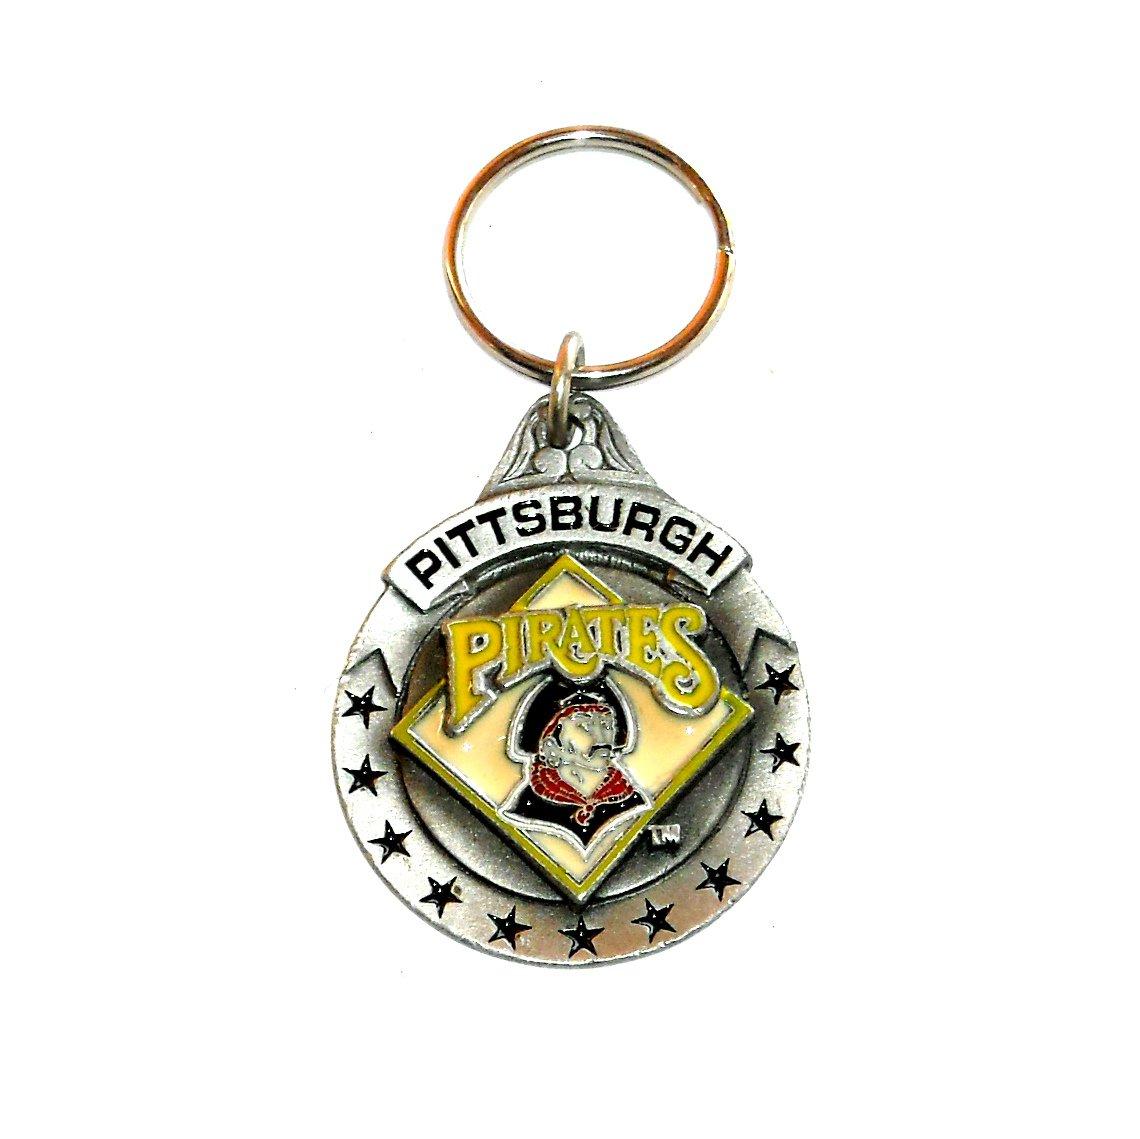 Pittsburgh Pirates National League Baseball Fob Key Ring Keychain